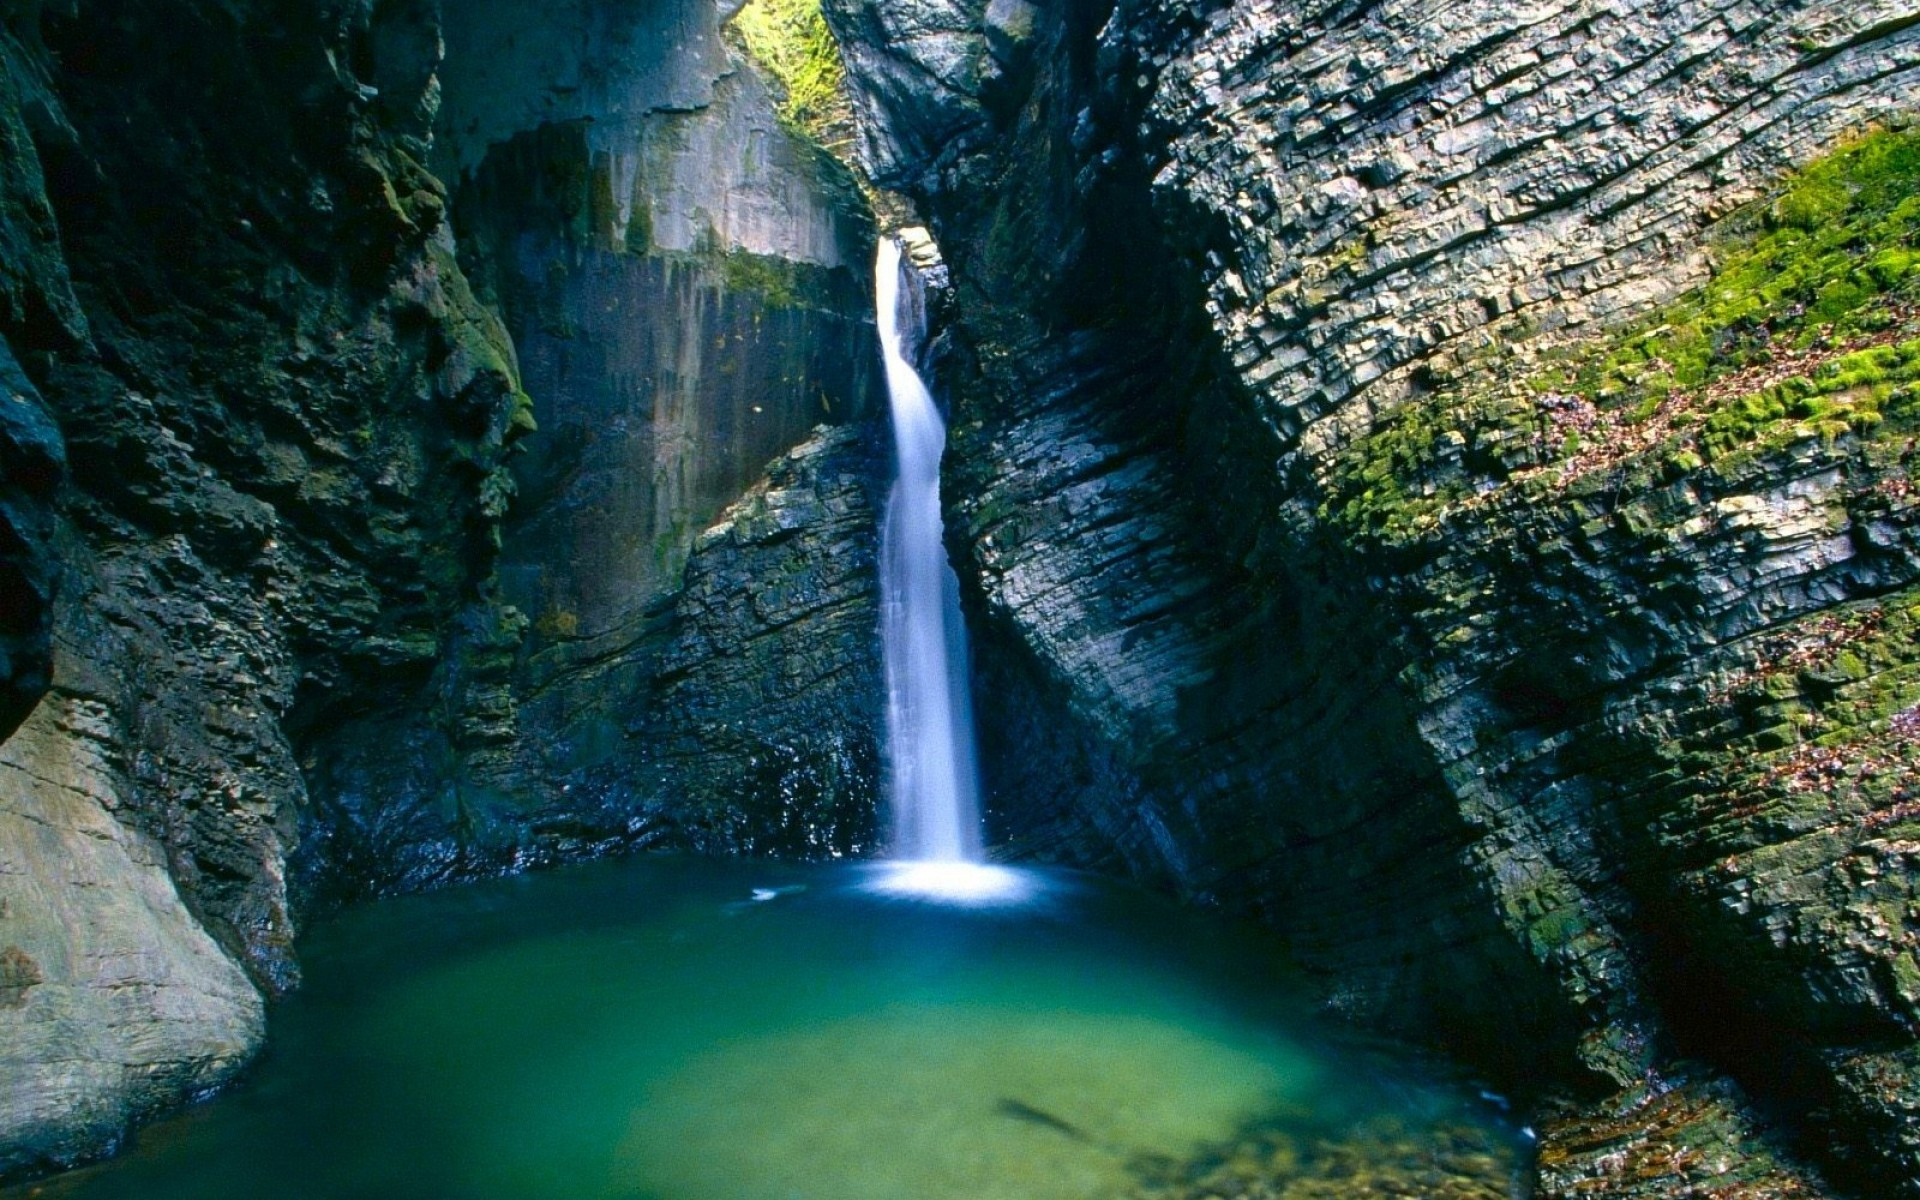 Beautiful Waterfall Wallpaper 19634 1920x1200 px HDWallSourcecom